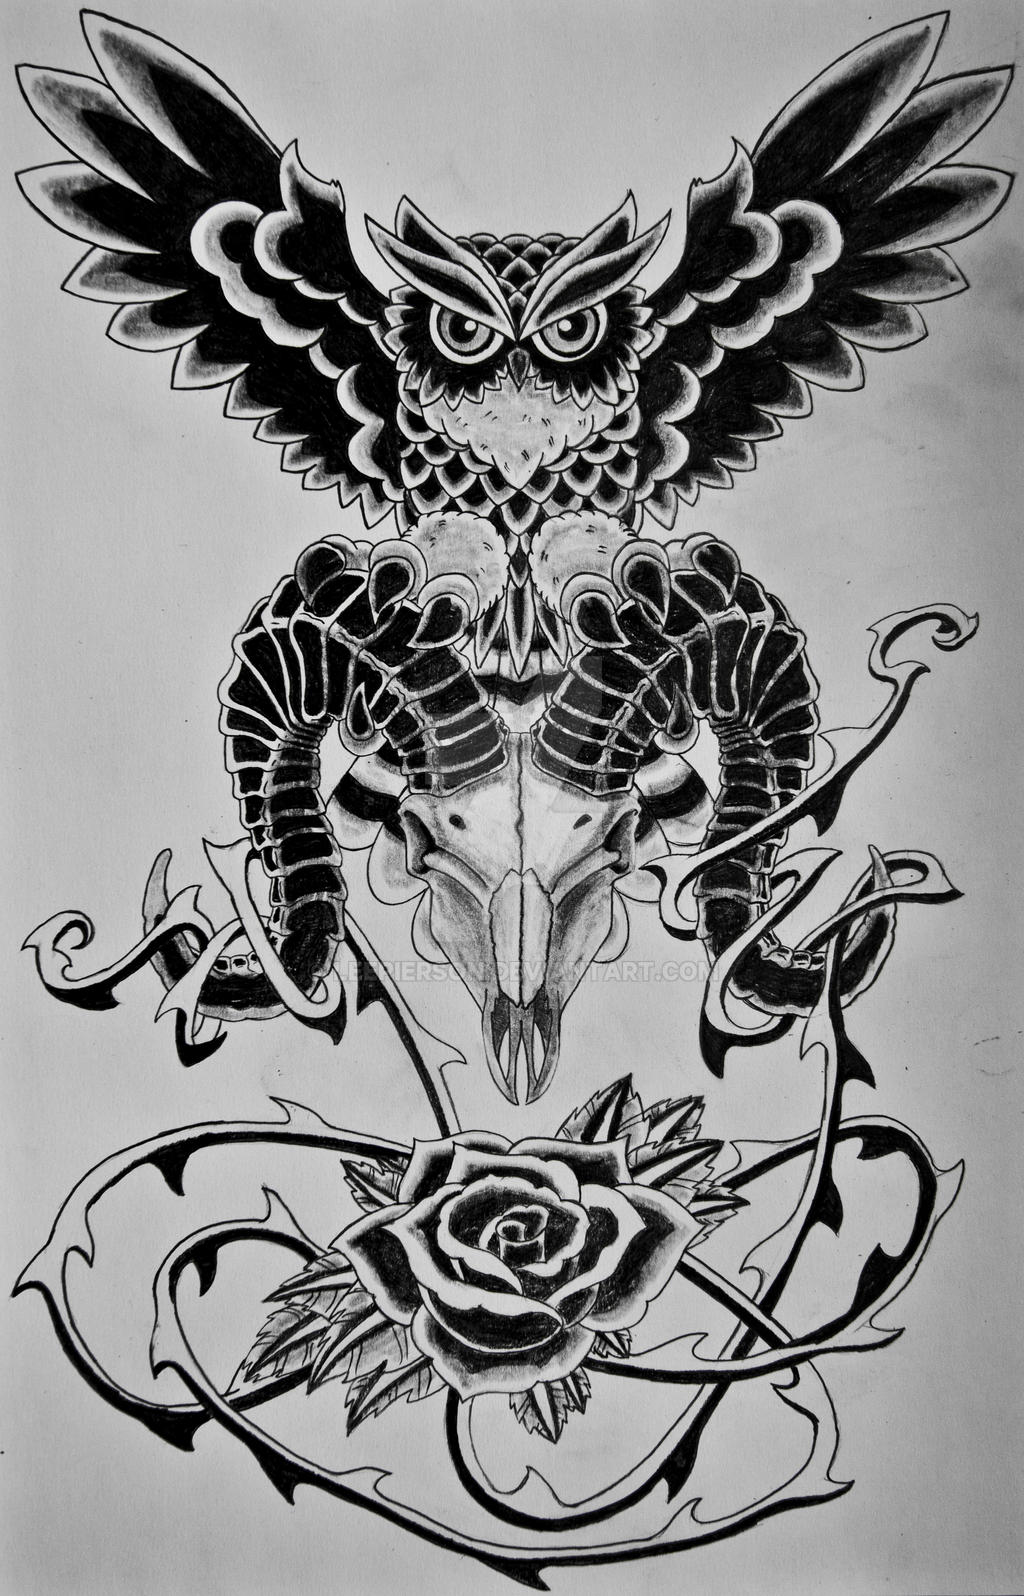 Owl Skull Rose by LeePierson on DeviantArt - photo#22